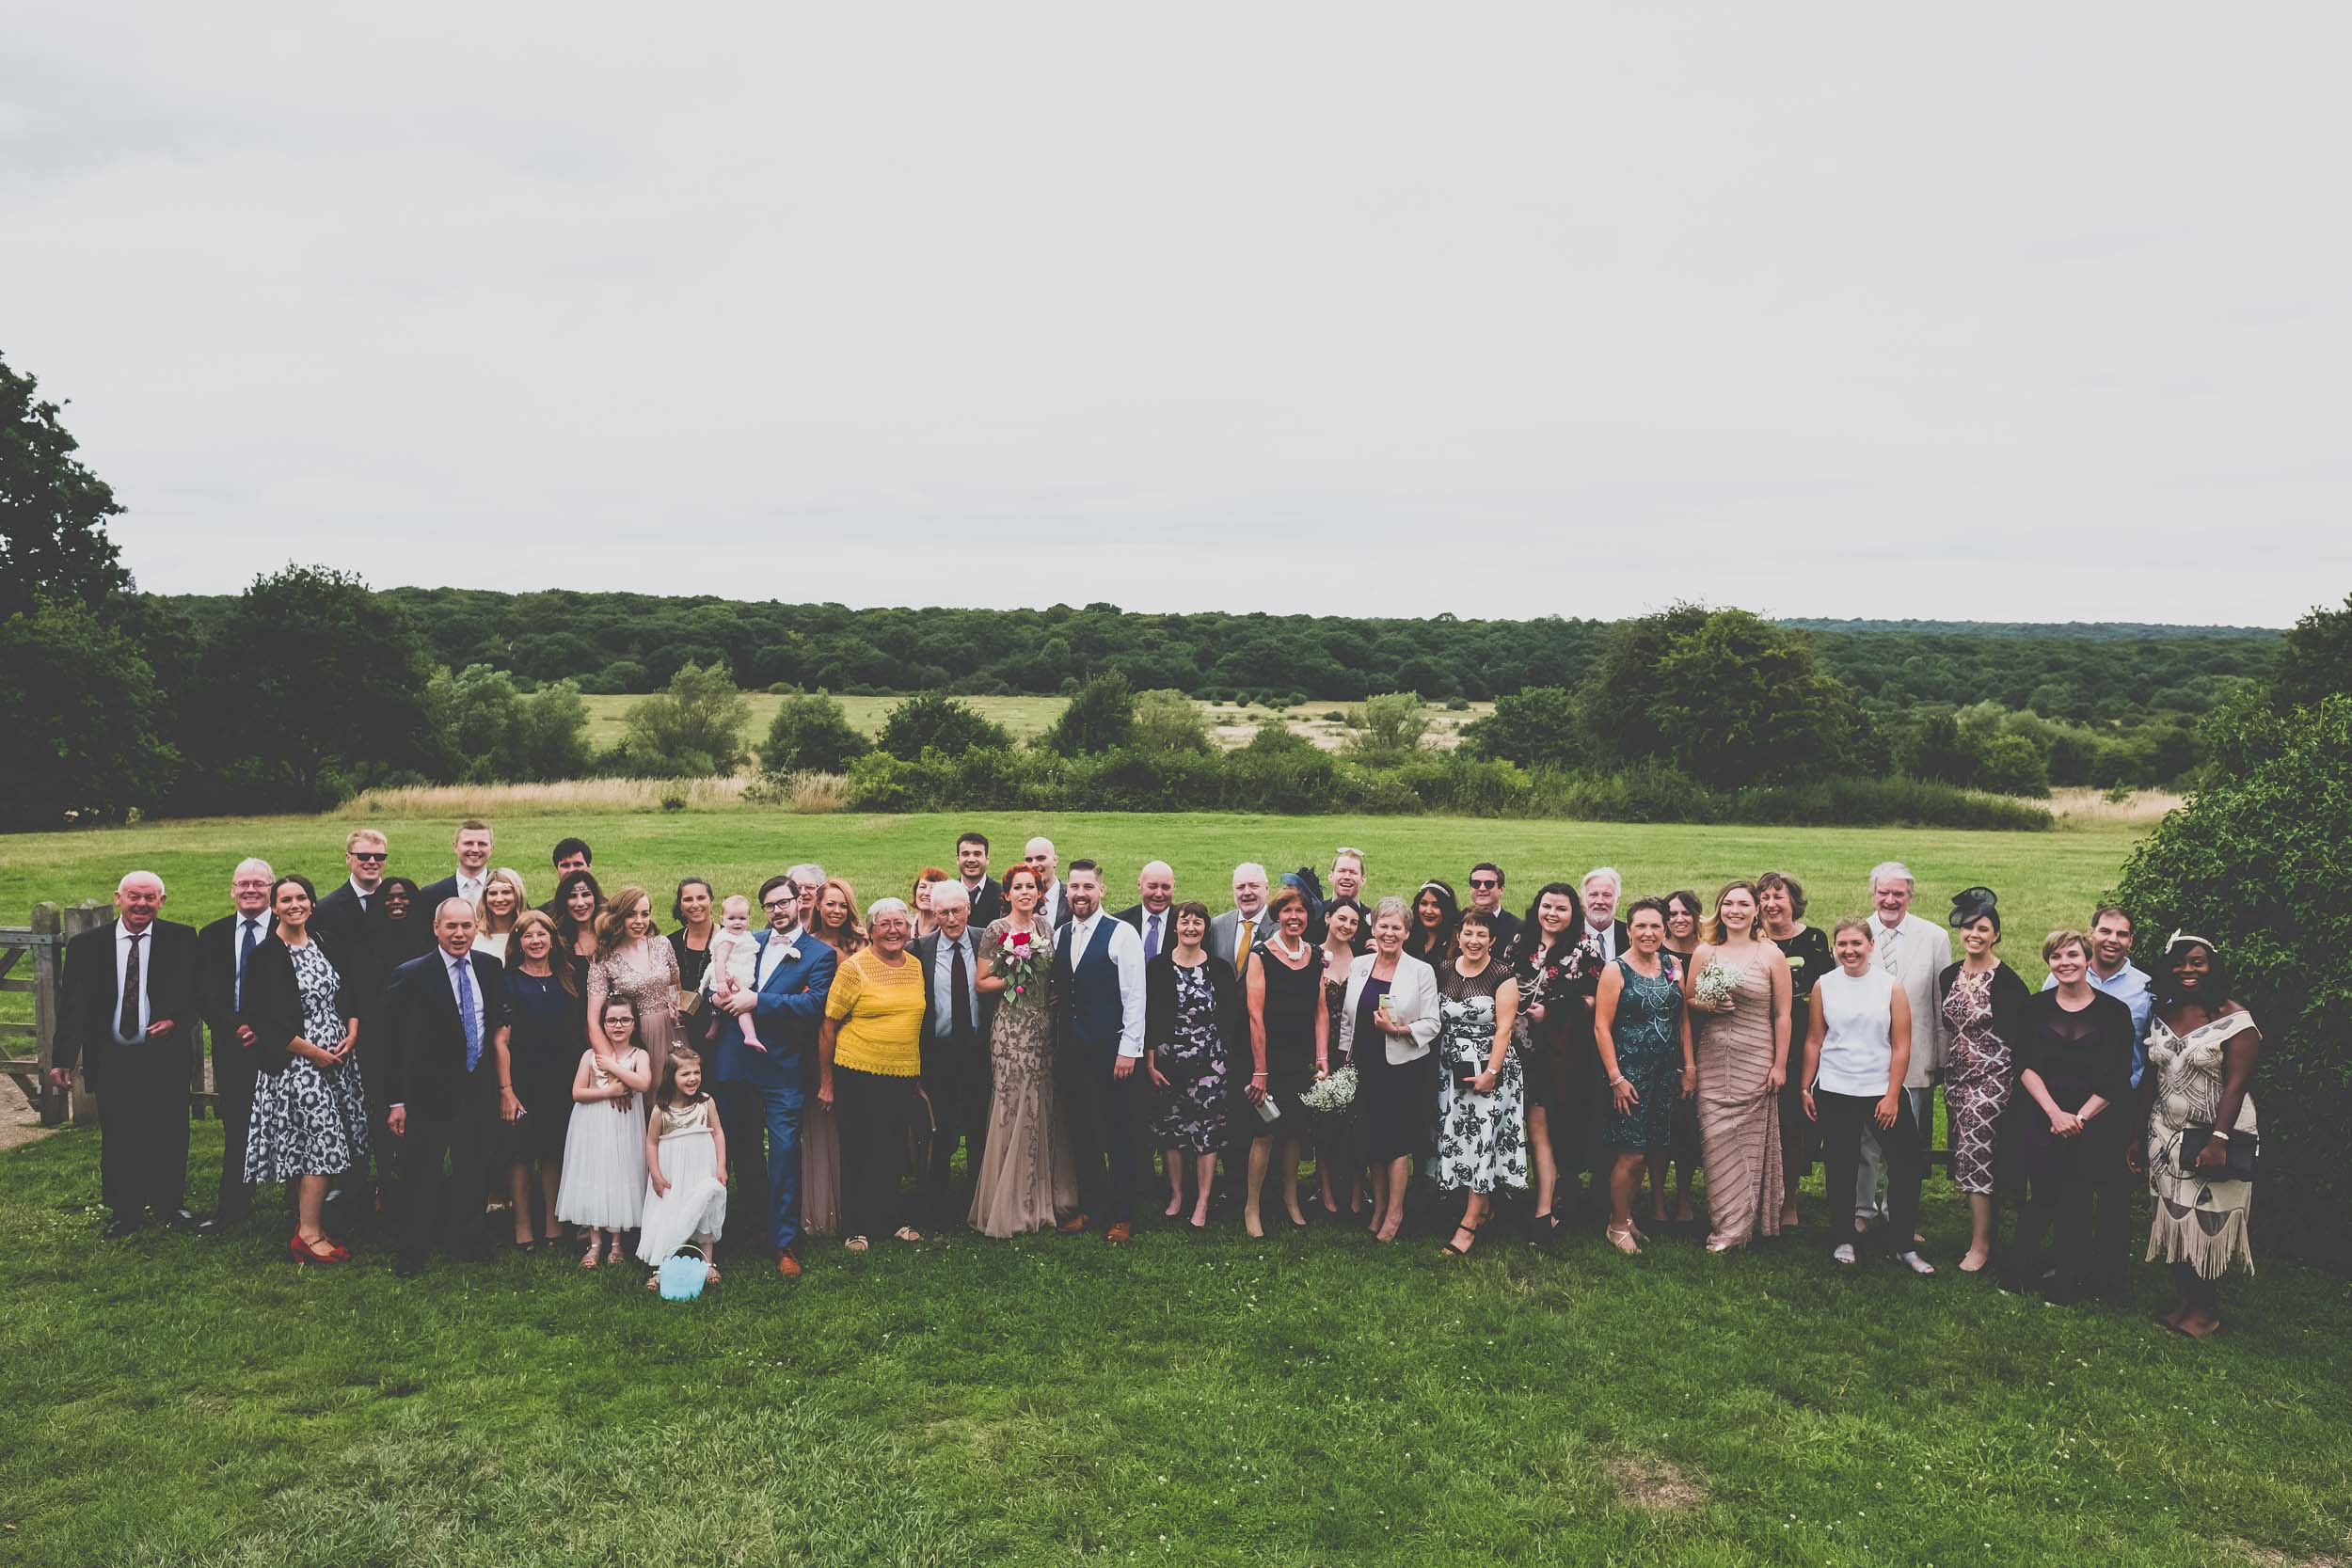 queen-elizabeths-hunting-lodge-epping-forest-wedding234.jpg